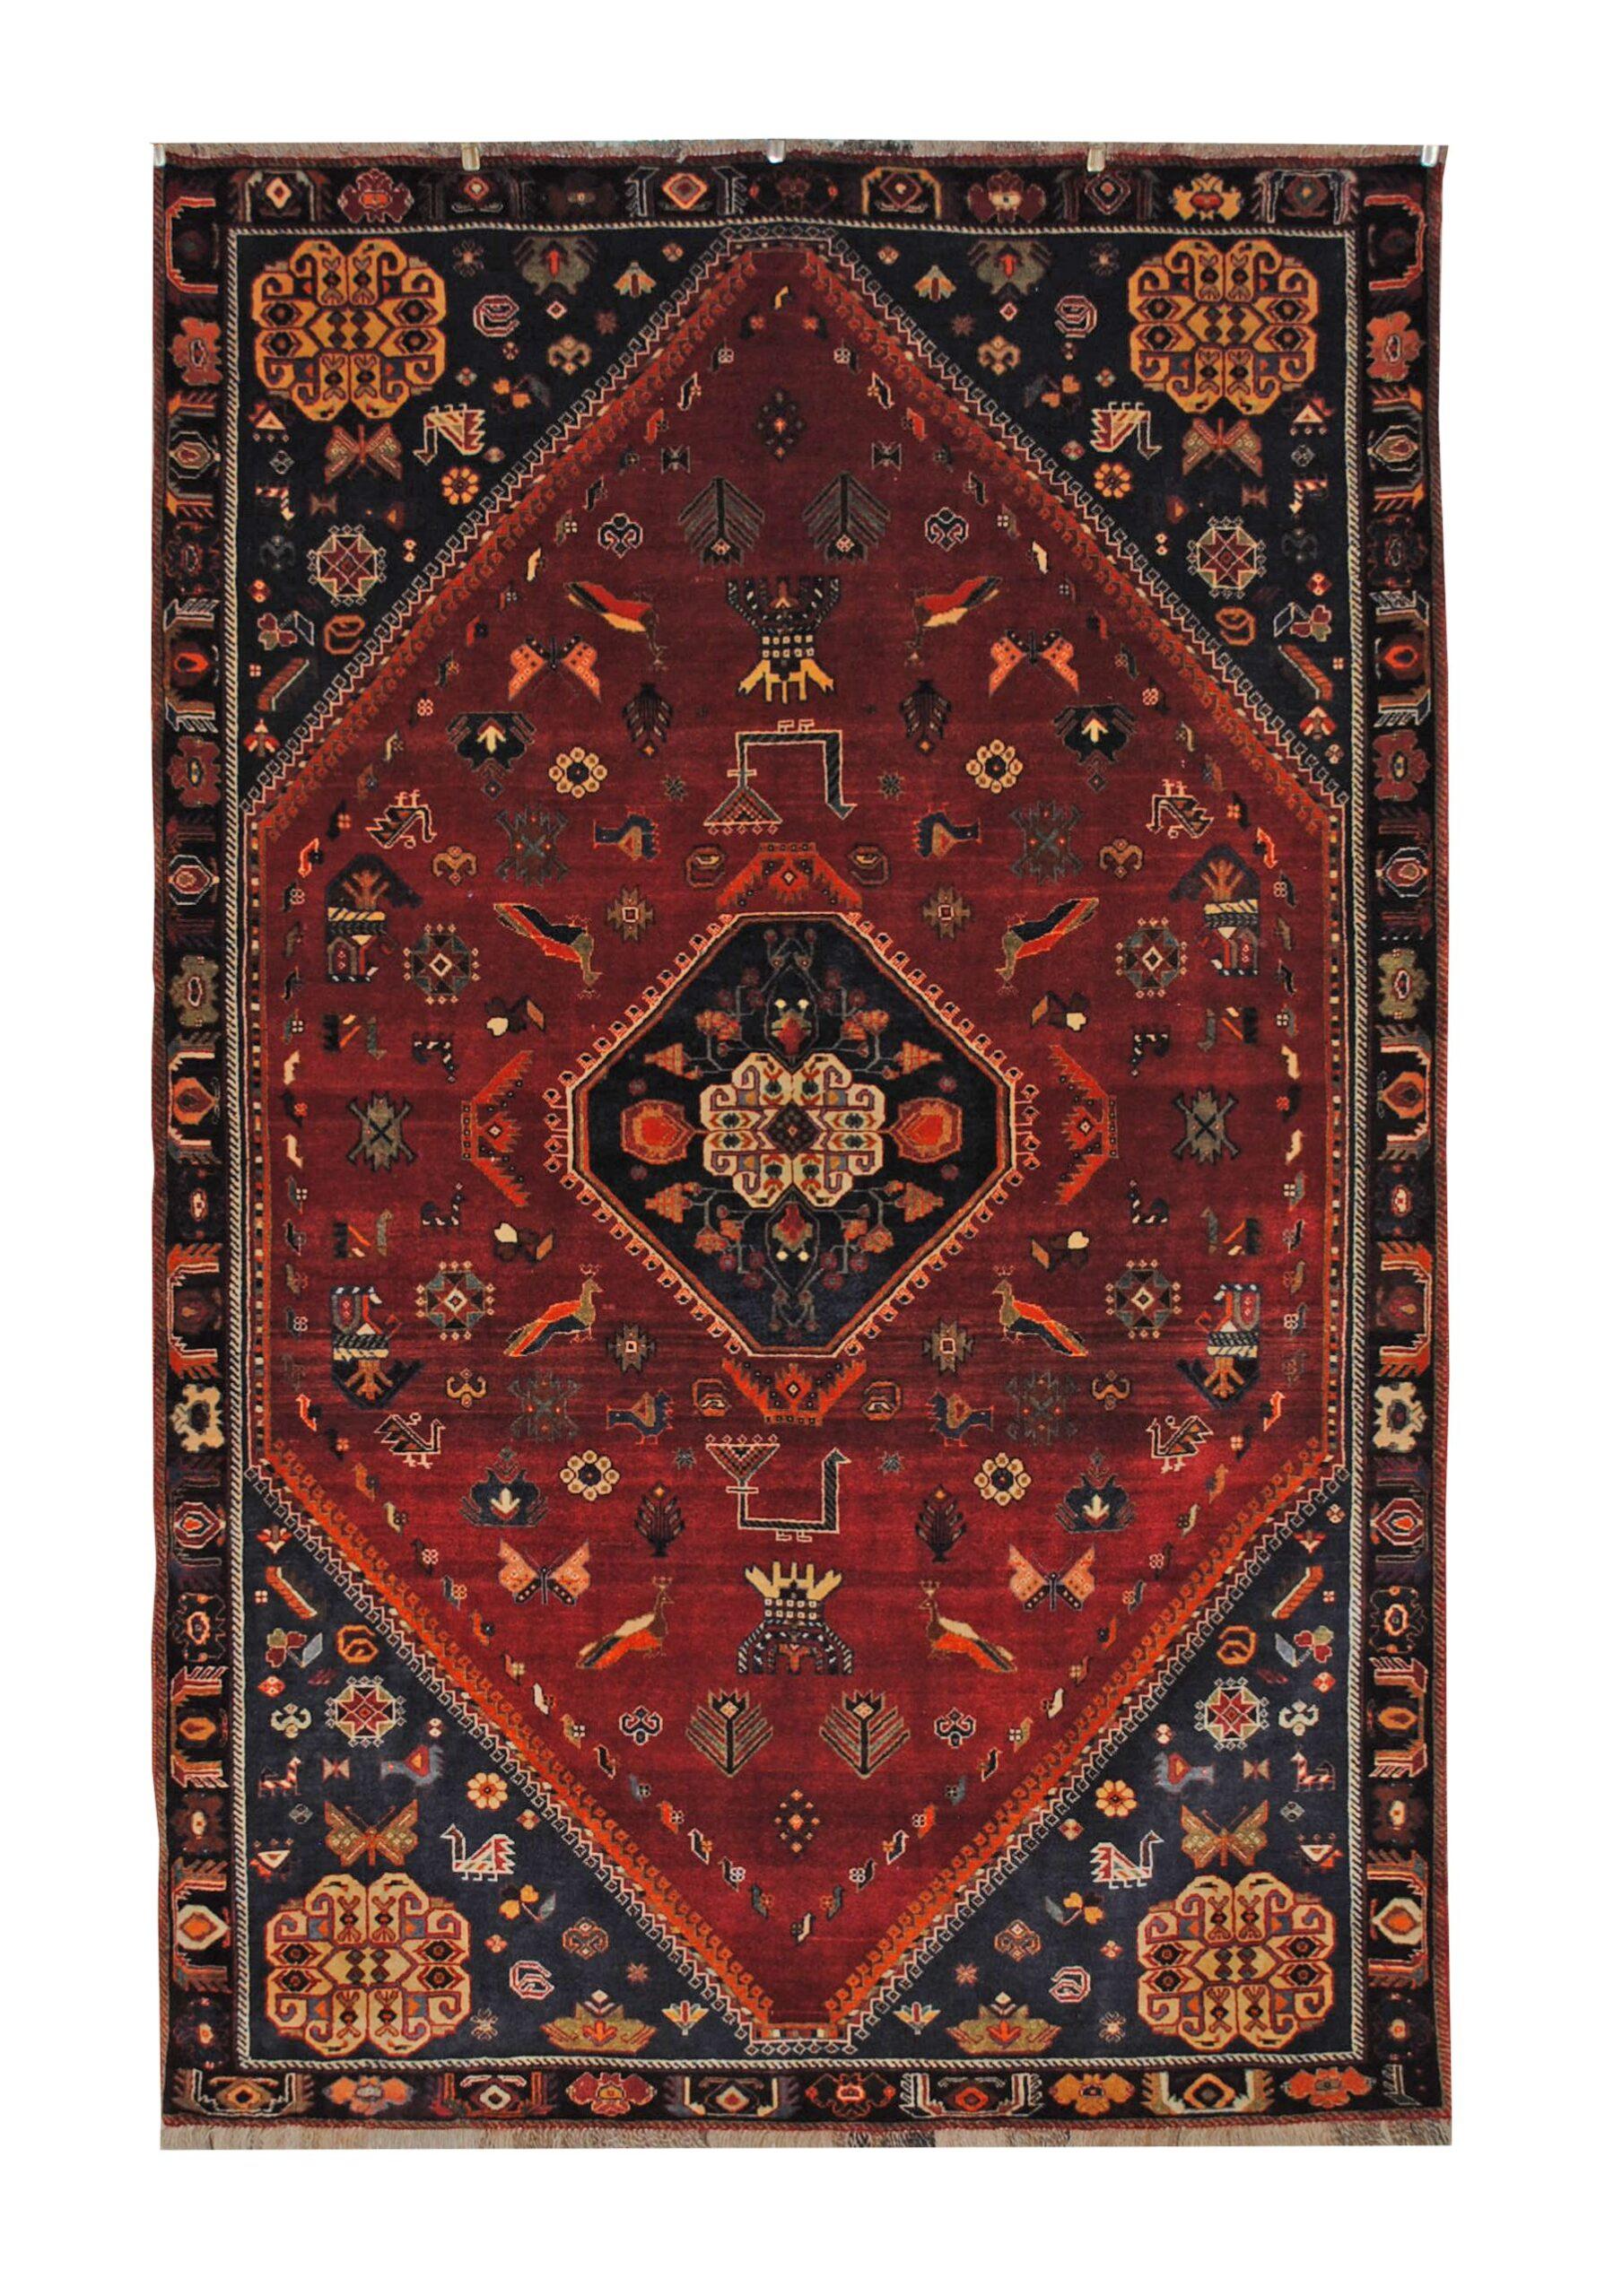 "Antique Persian Ghashghaei 5' 2"" x 8' Handmade Wool Area Rug - Shabahang Royal Carpet"